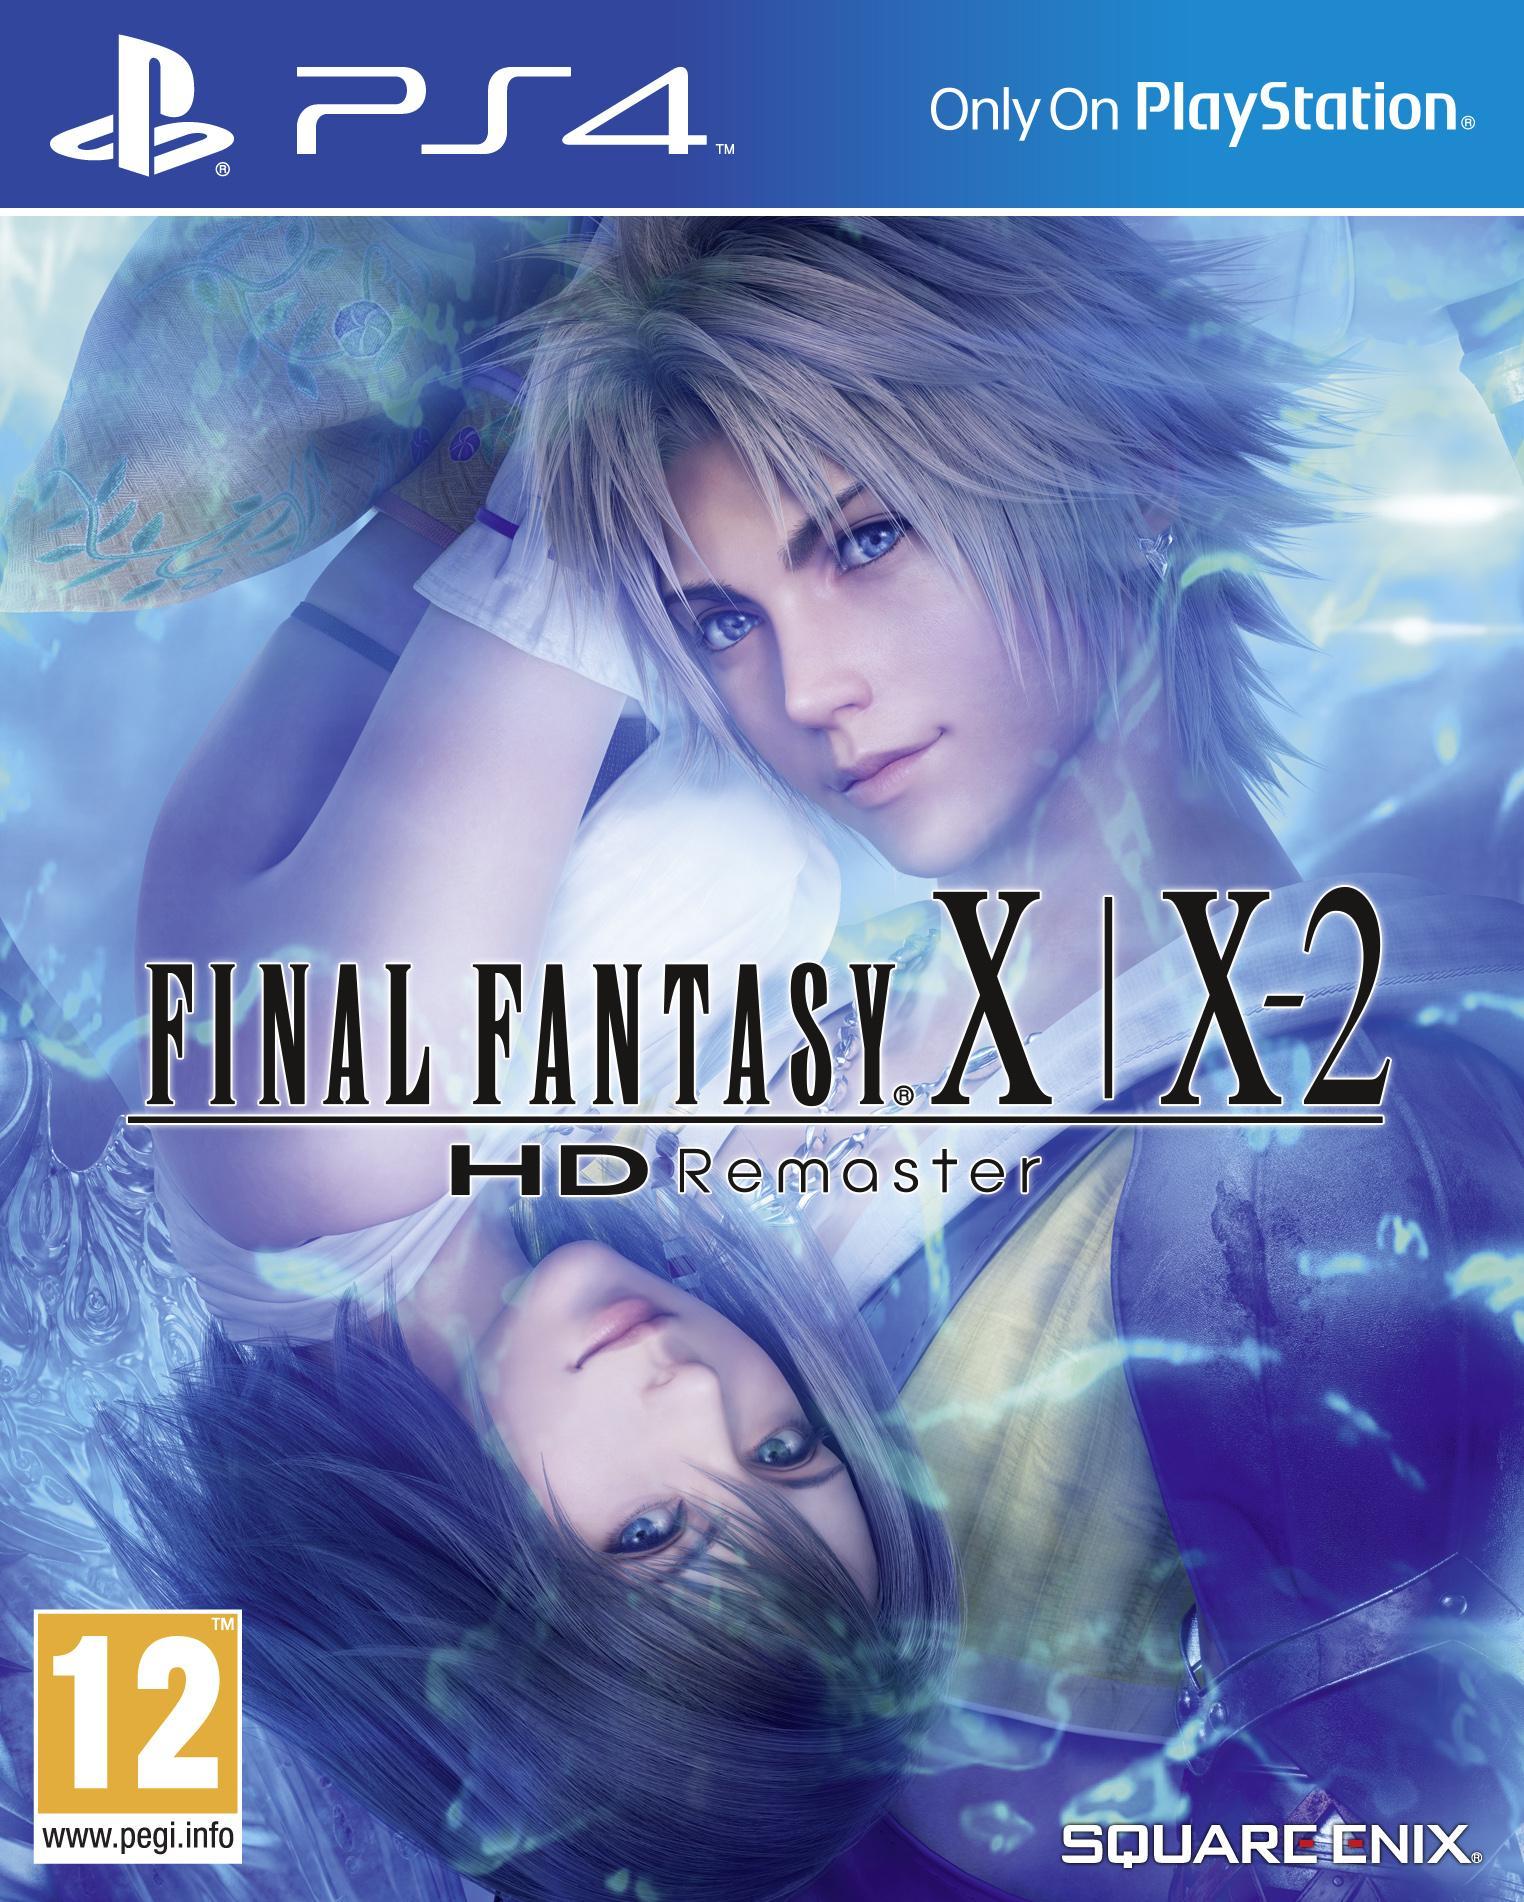 Final Fantasy X/X-2 HD Remaster sur PlayStation 4